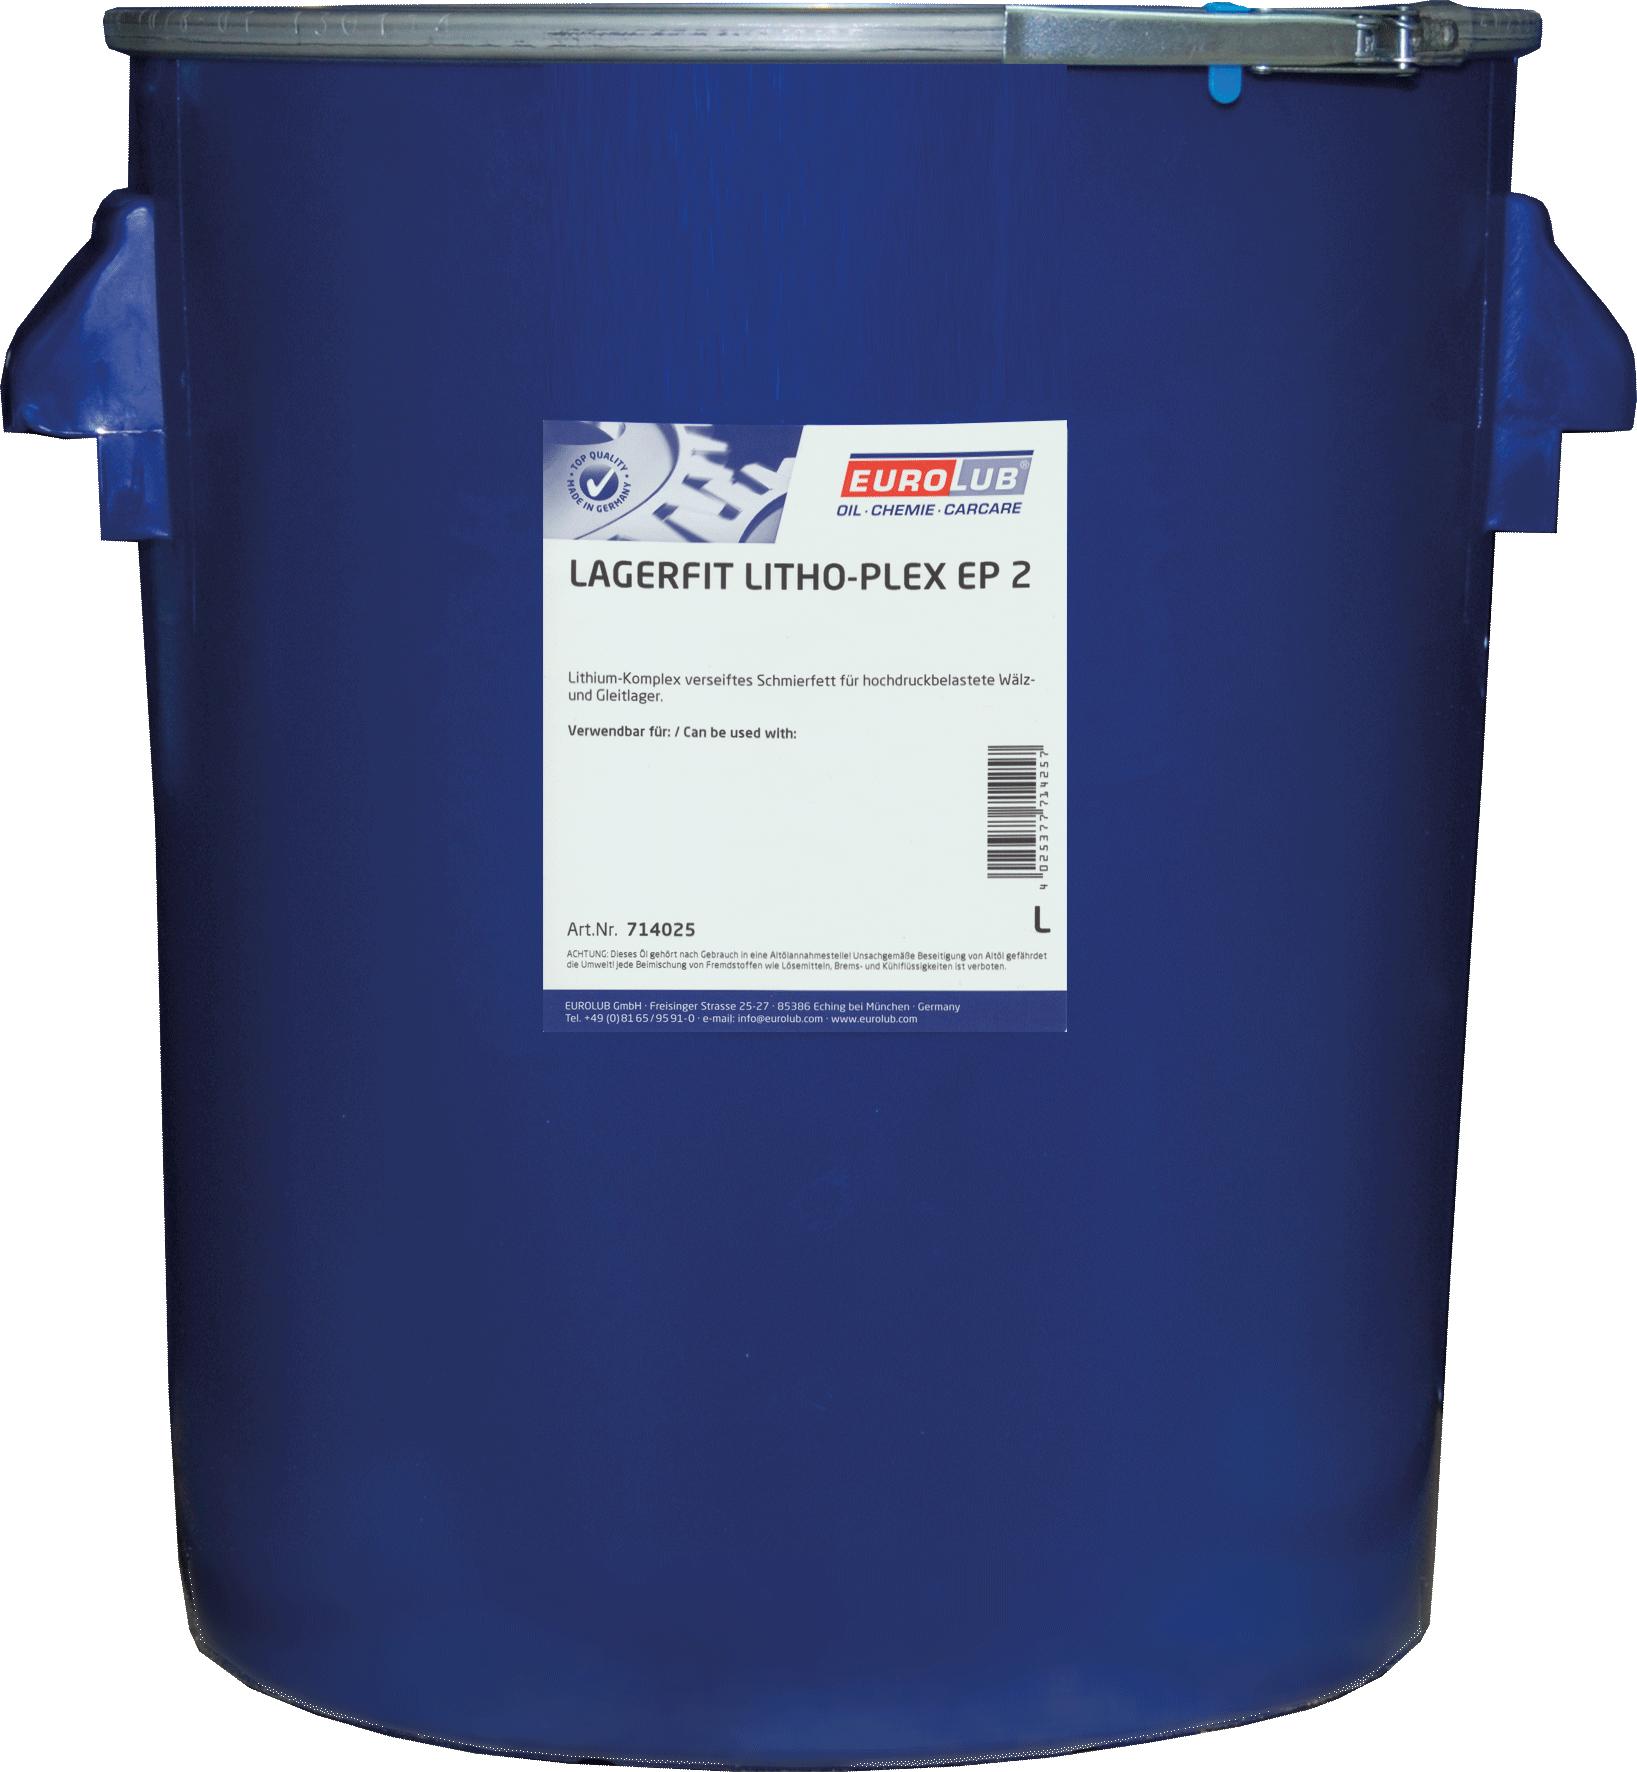 EUROLUB Lagerfit Lithoplex EP 2 (литиевая смазка, c повышеной рабочей температурой), 25л